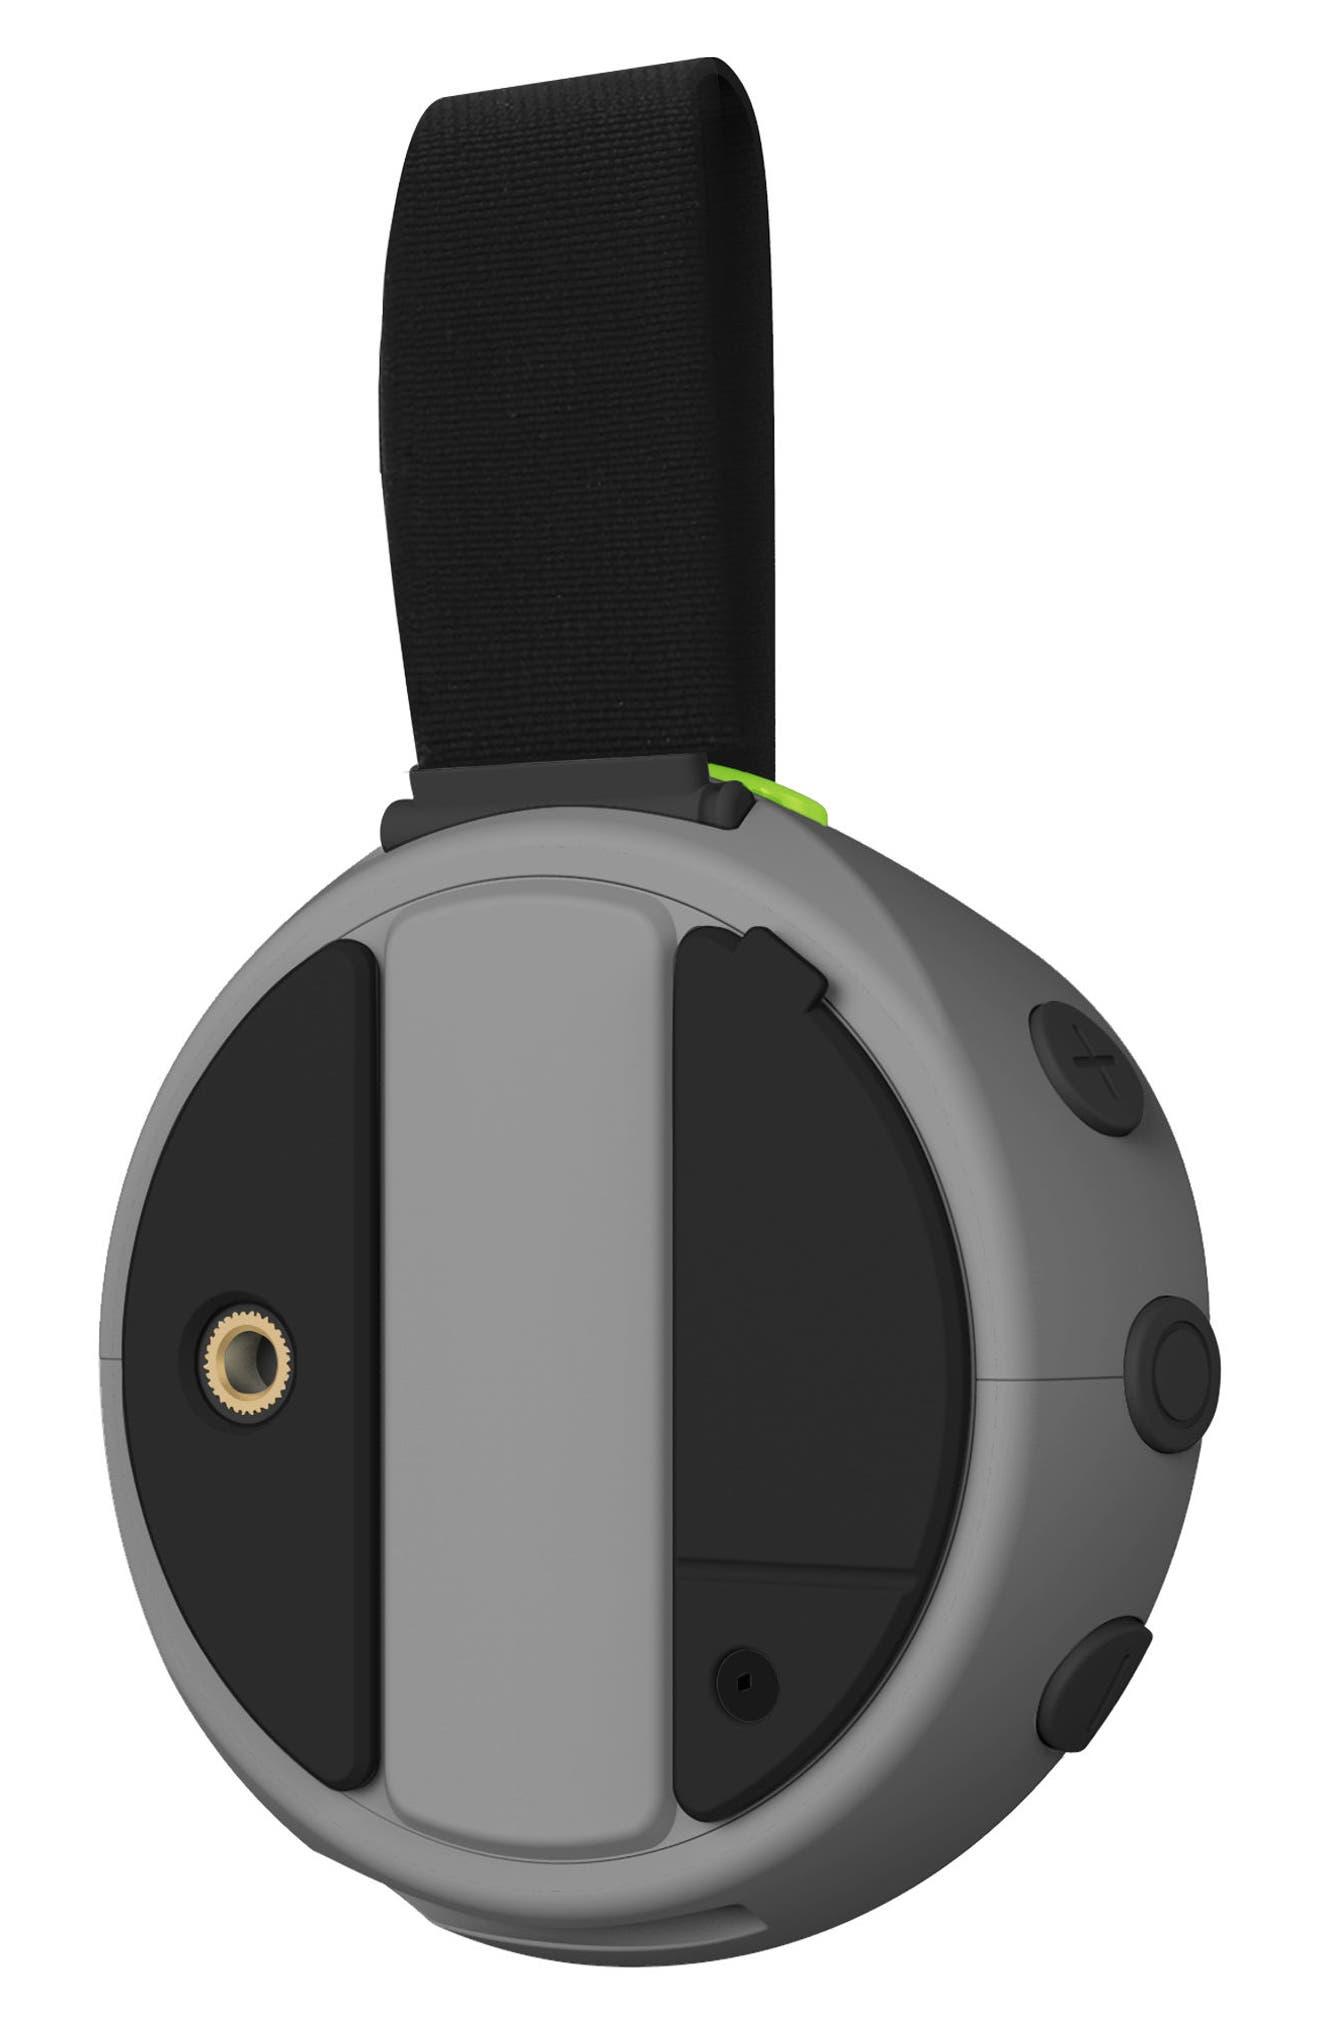 105 Portable Waterproof Bluetooth Speaker,                             Alternate thumbnail 3, color,                             Silver/ Green